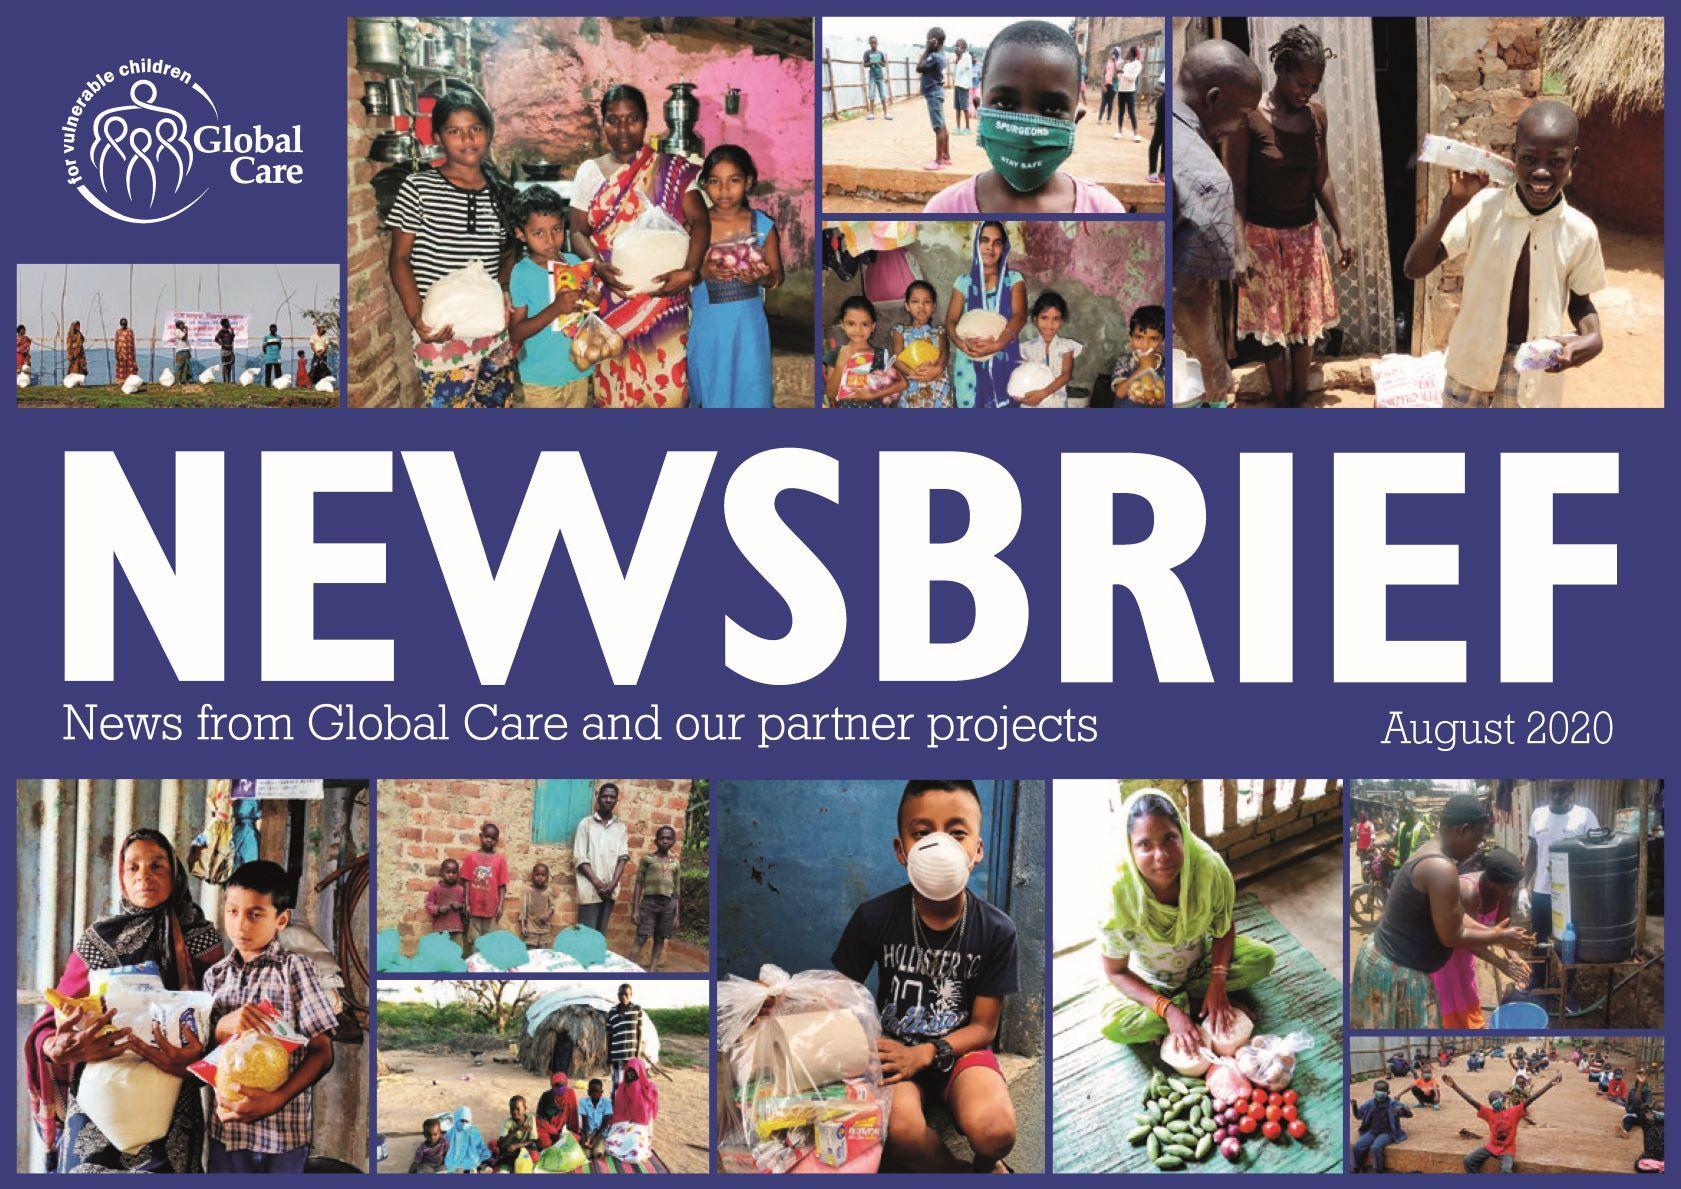 Newsbrief Magazine August 2020 cover